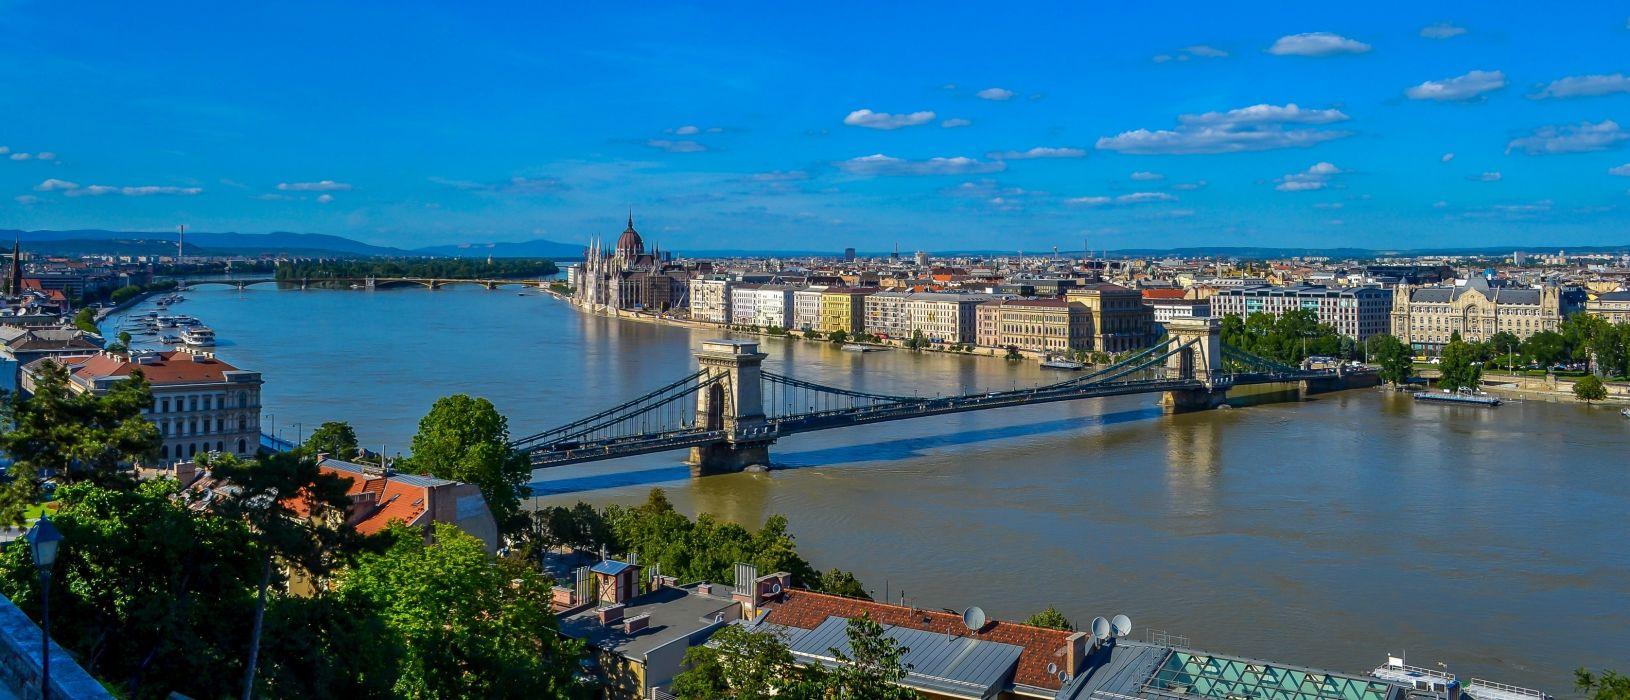 Bridges Rivers Hungary Budapest Danube River Chain Bridge Cities wallpaper